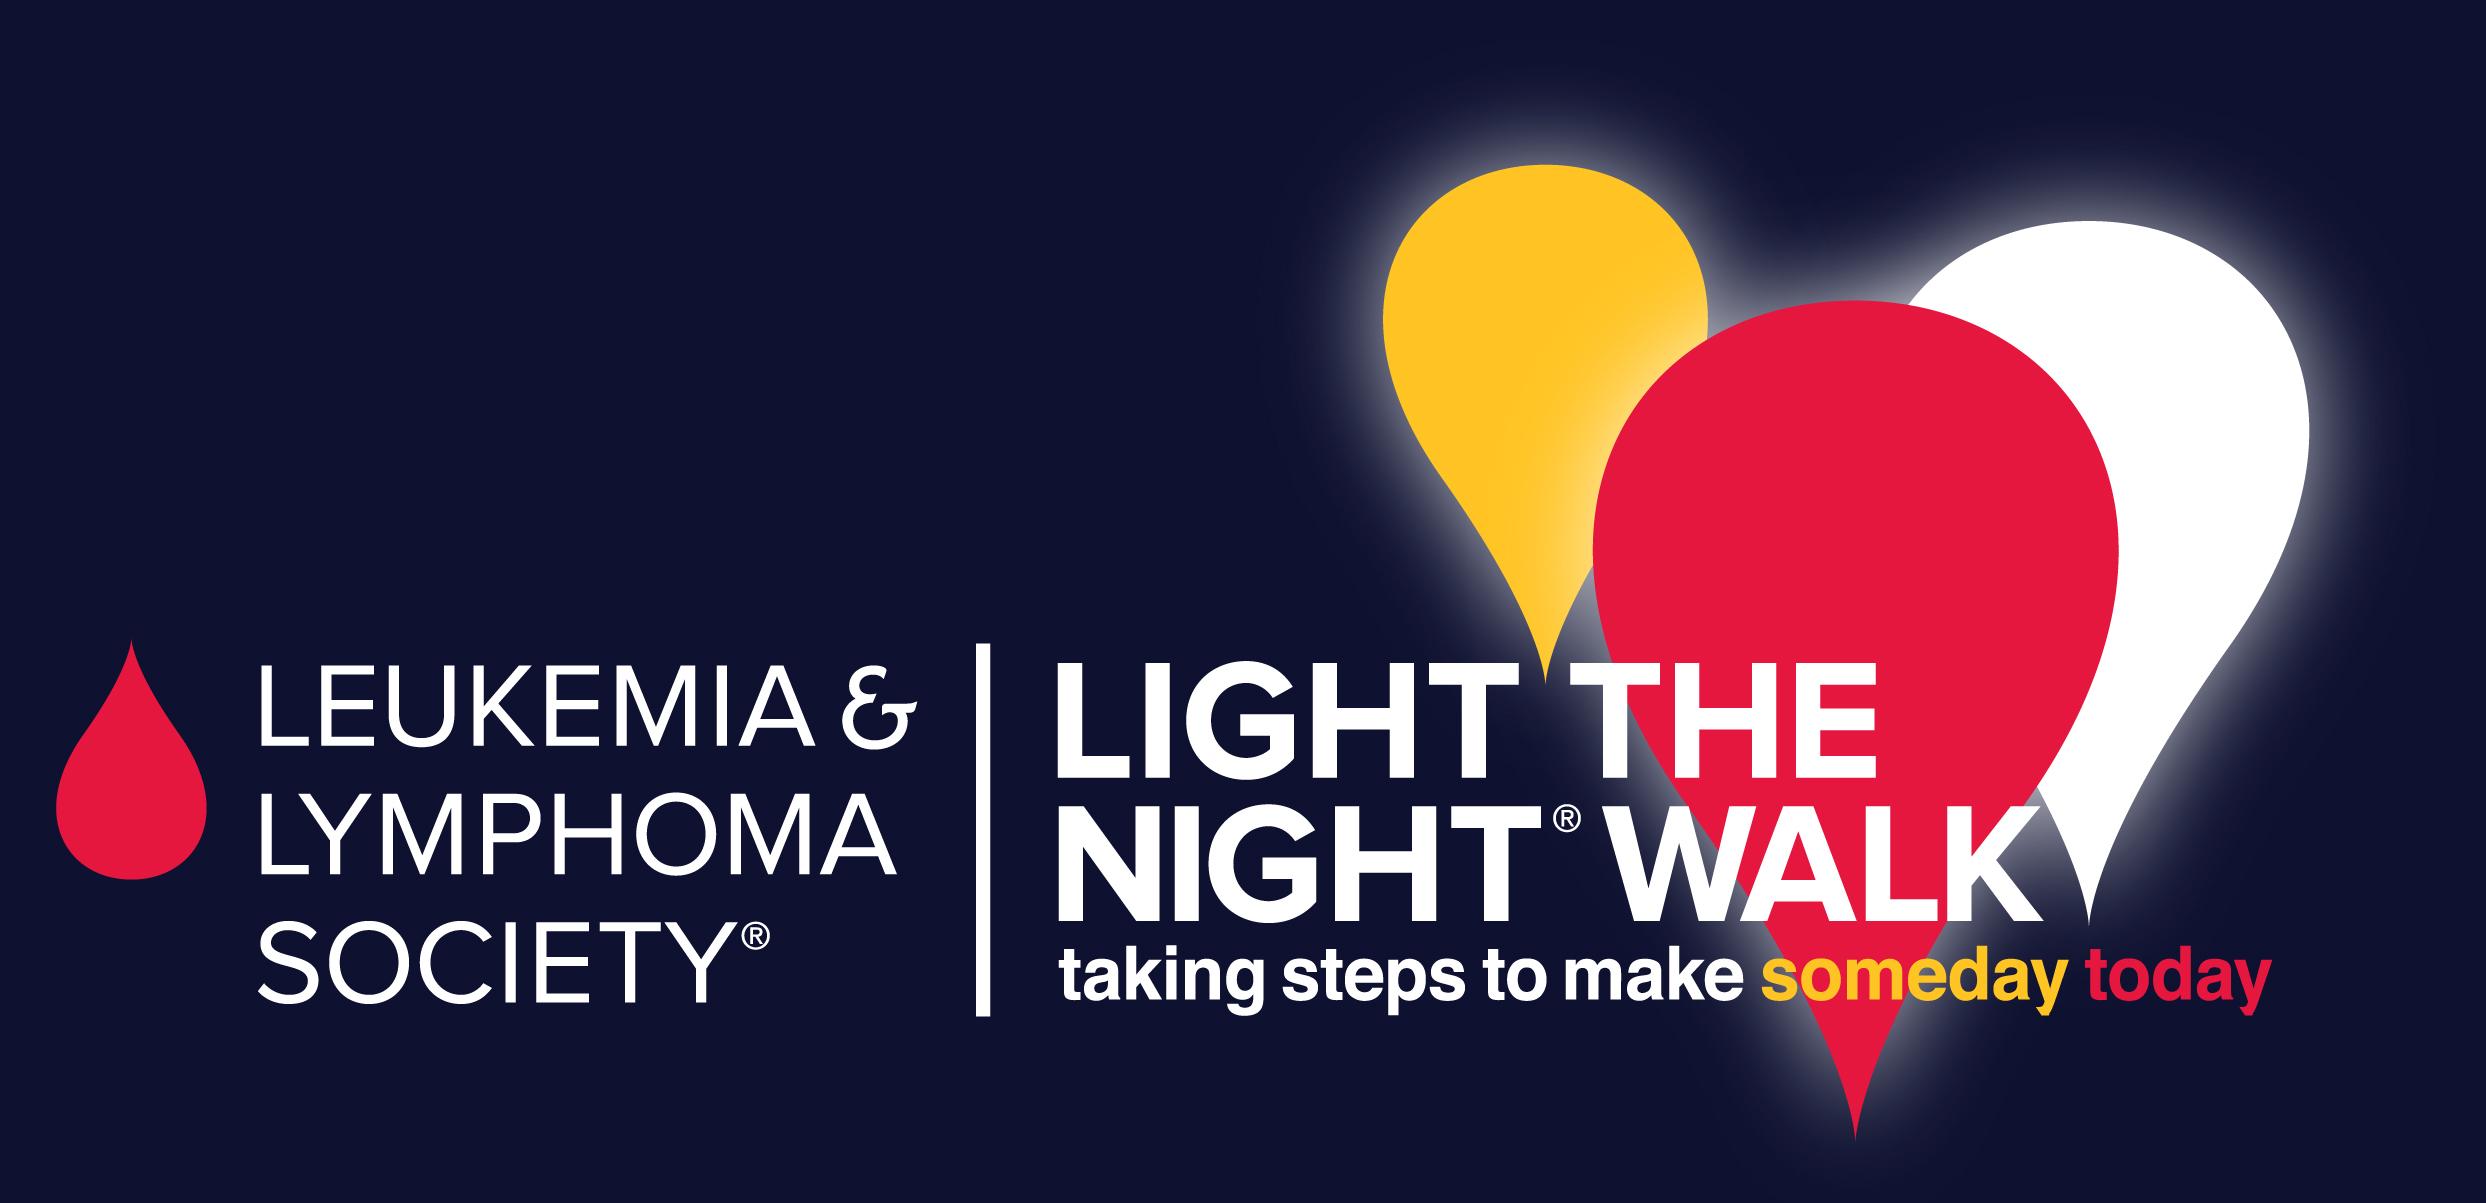 Light The Night Walk logo